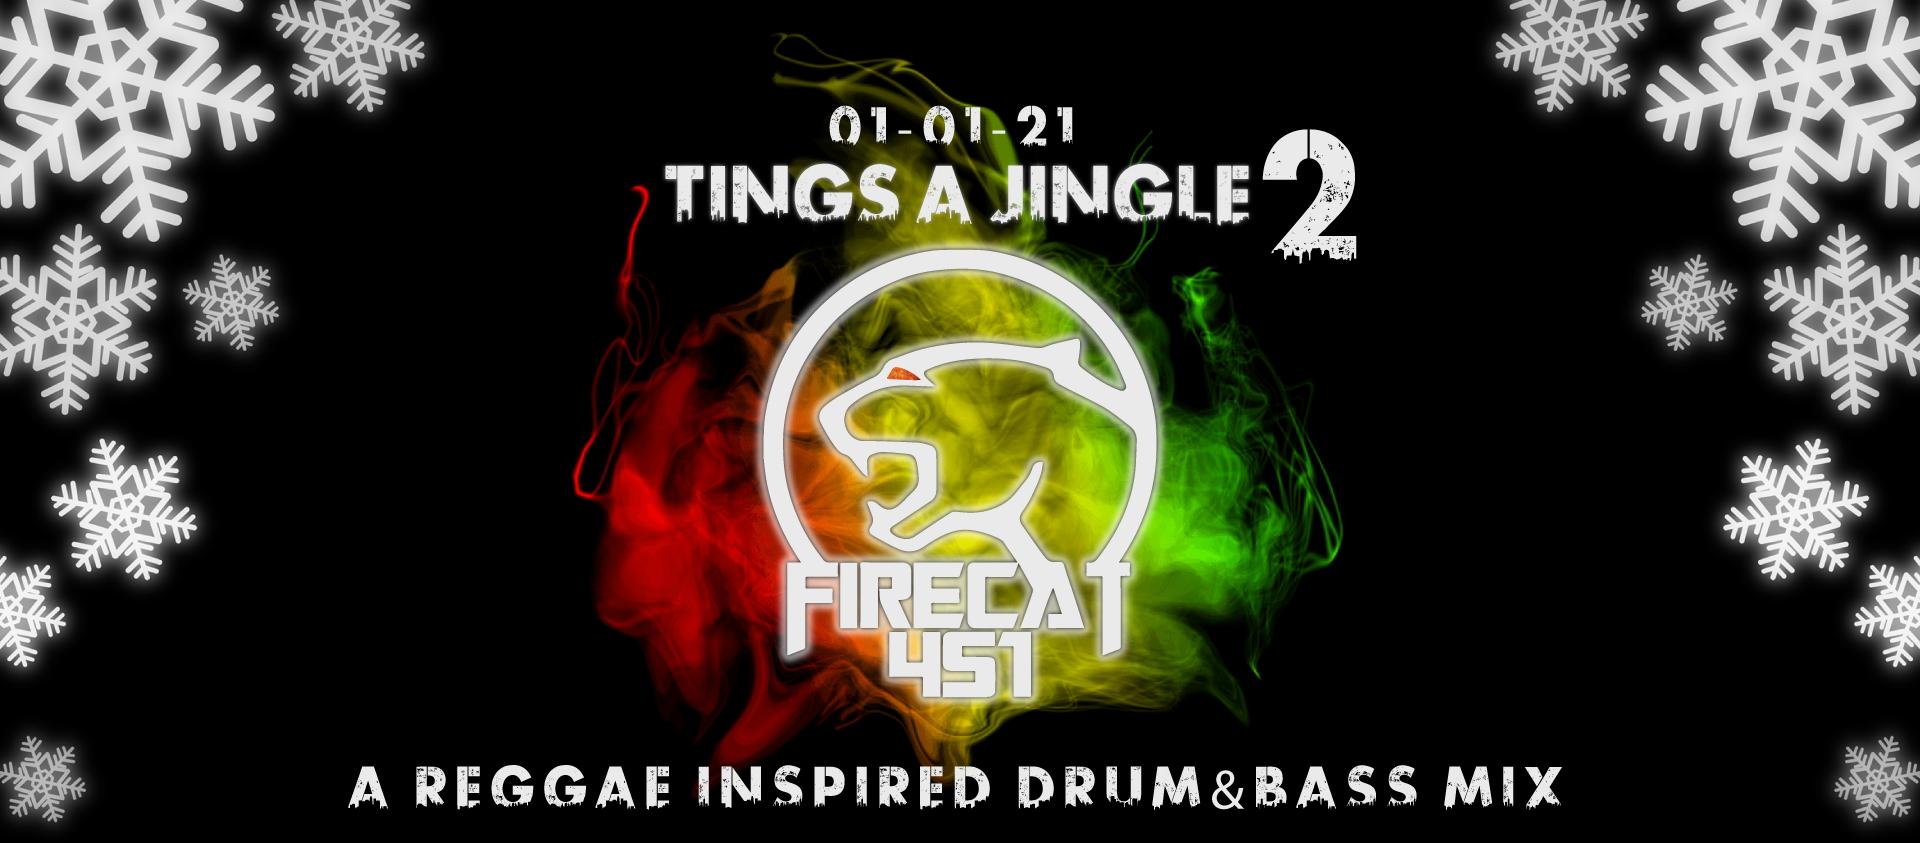 Tings A Jingle 2 cover art